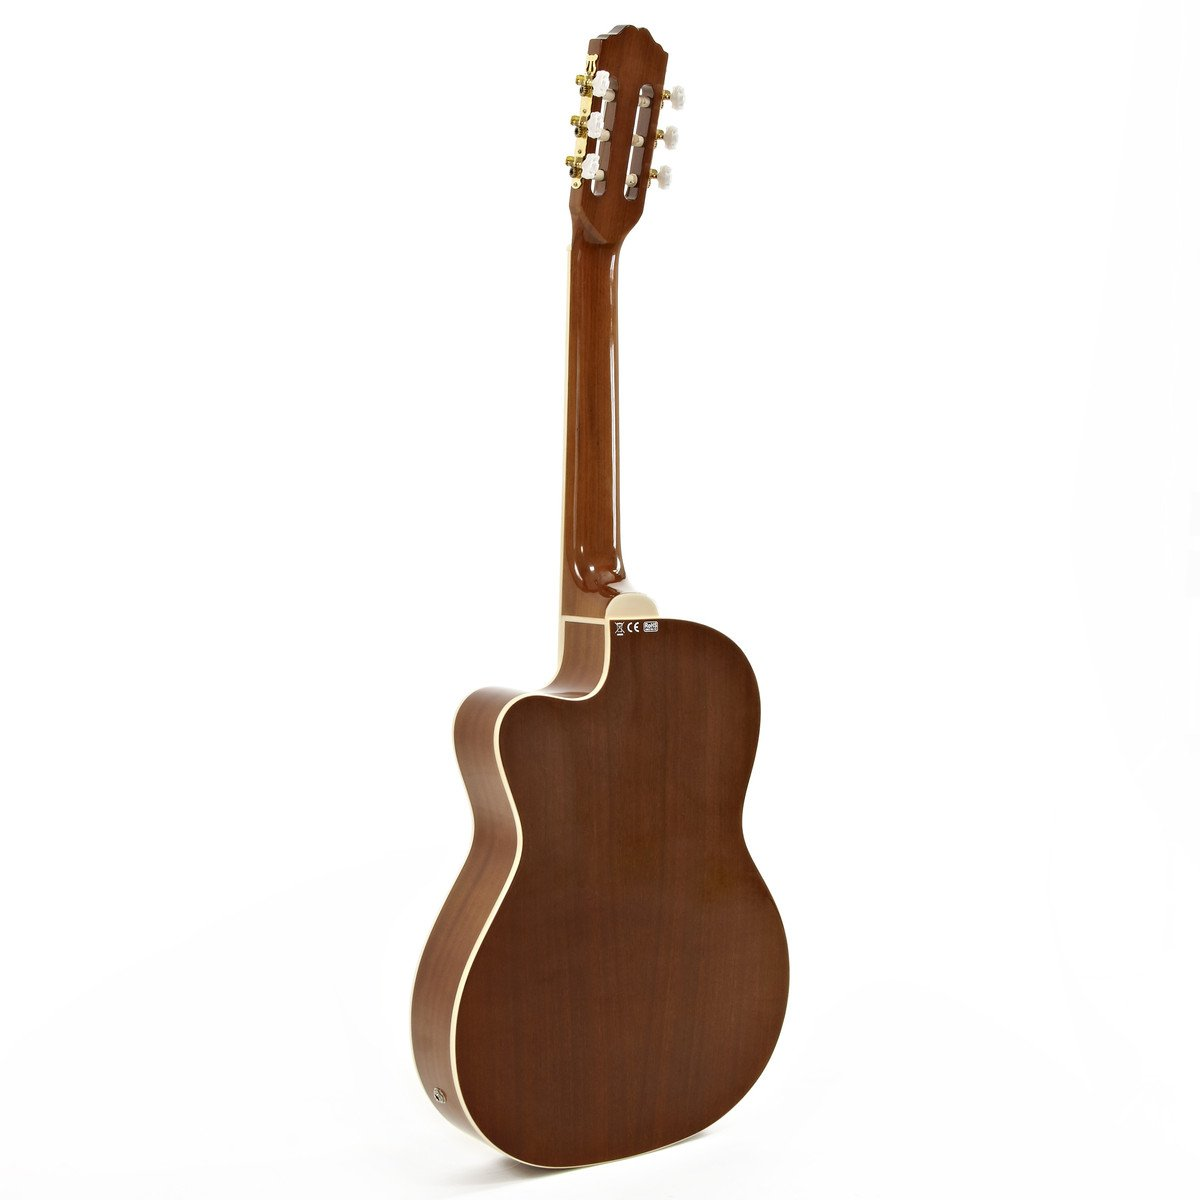 Paquete de Guitarra Clásica Electroacústica Thinline + Amplificador de 15W